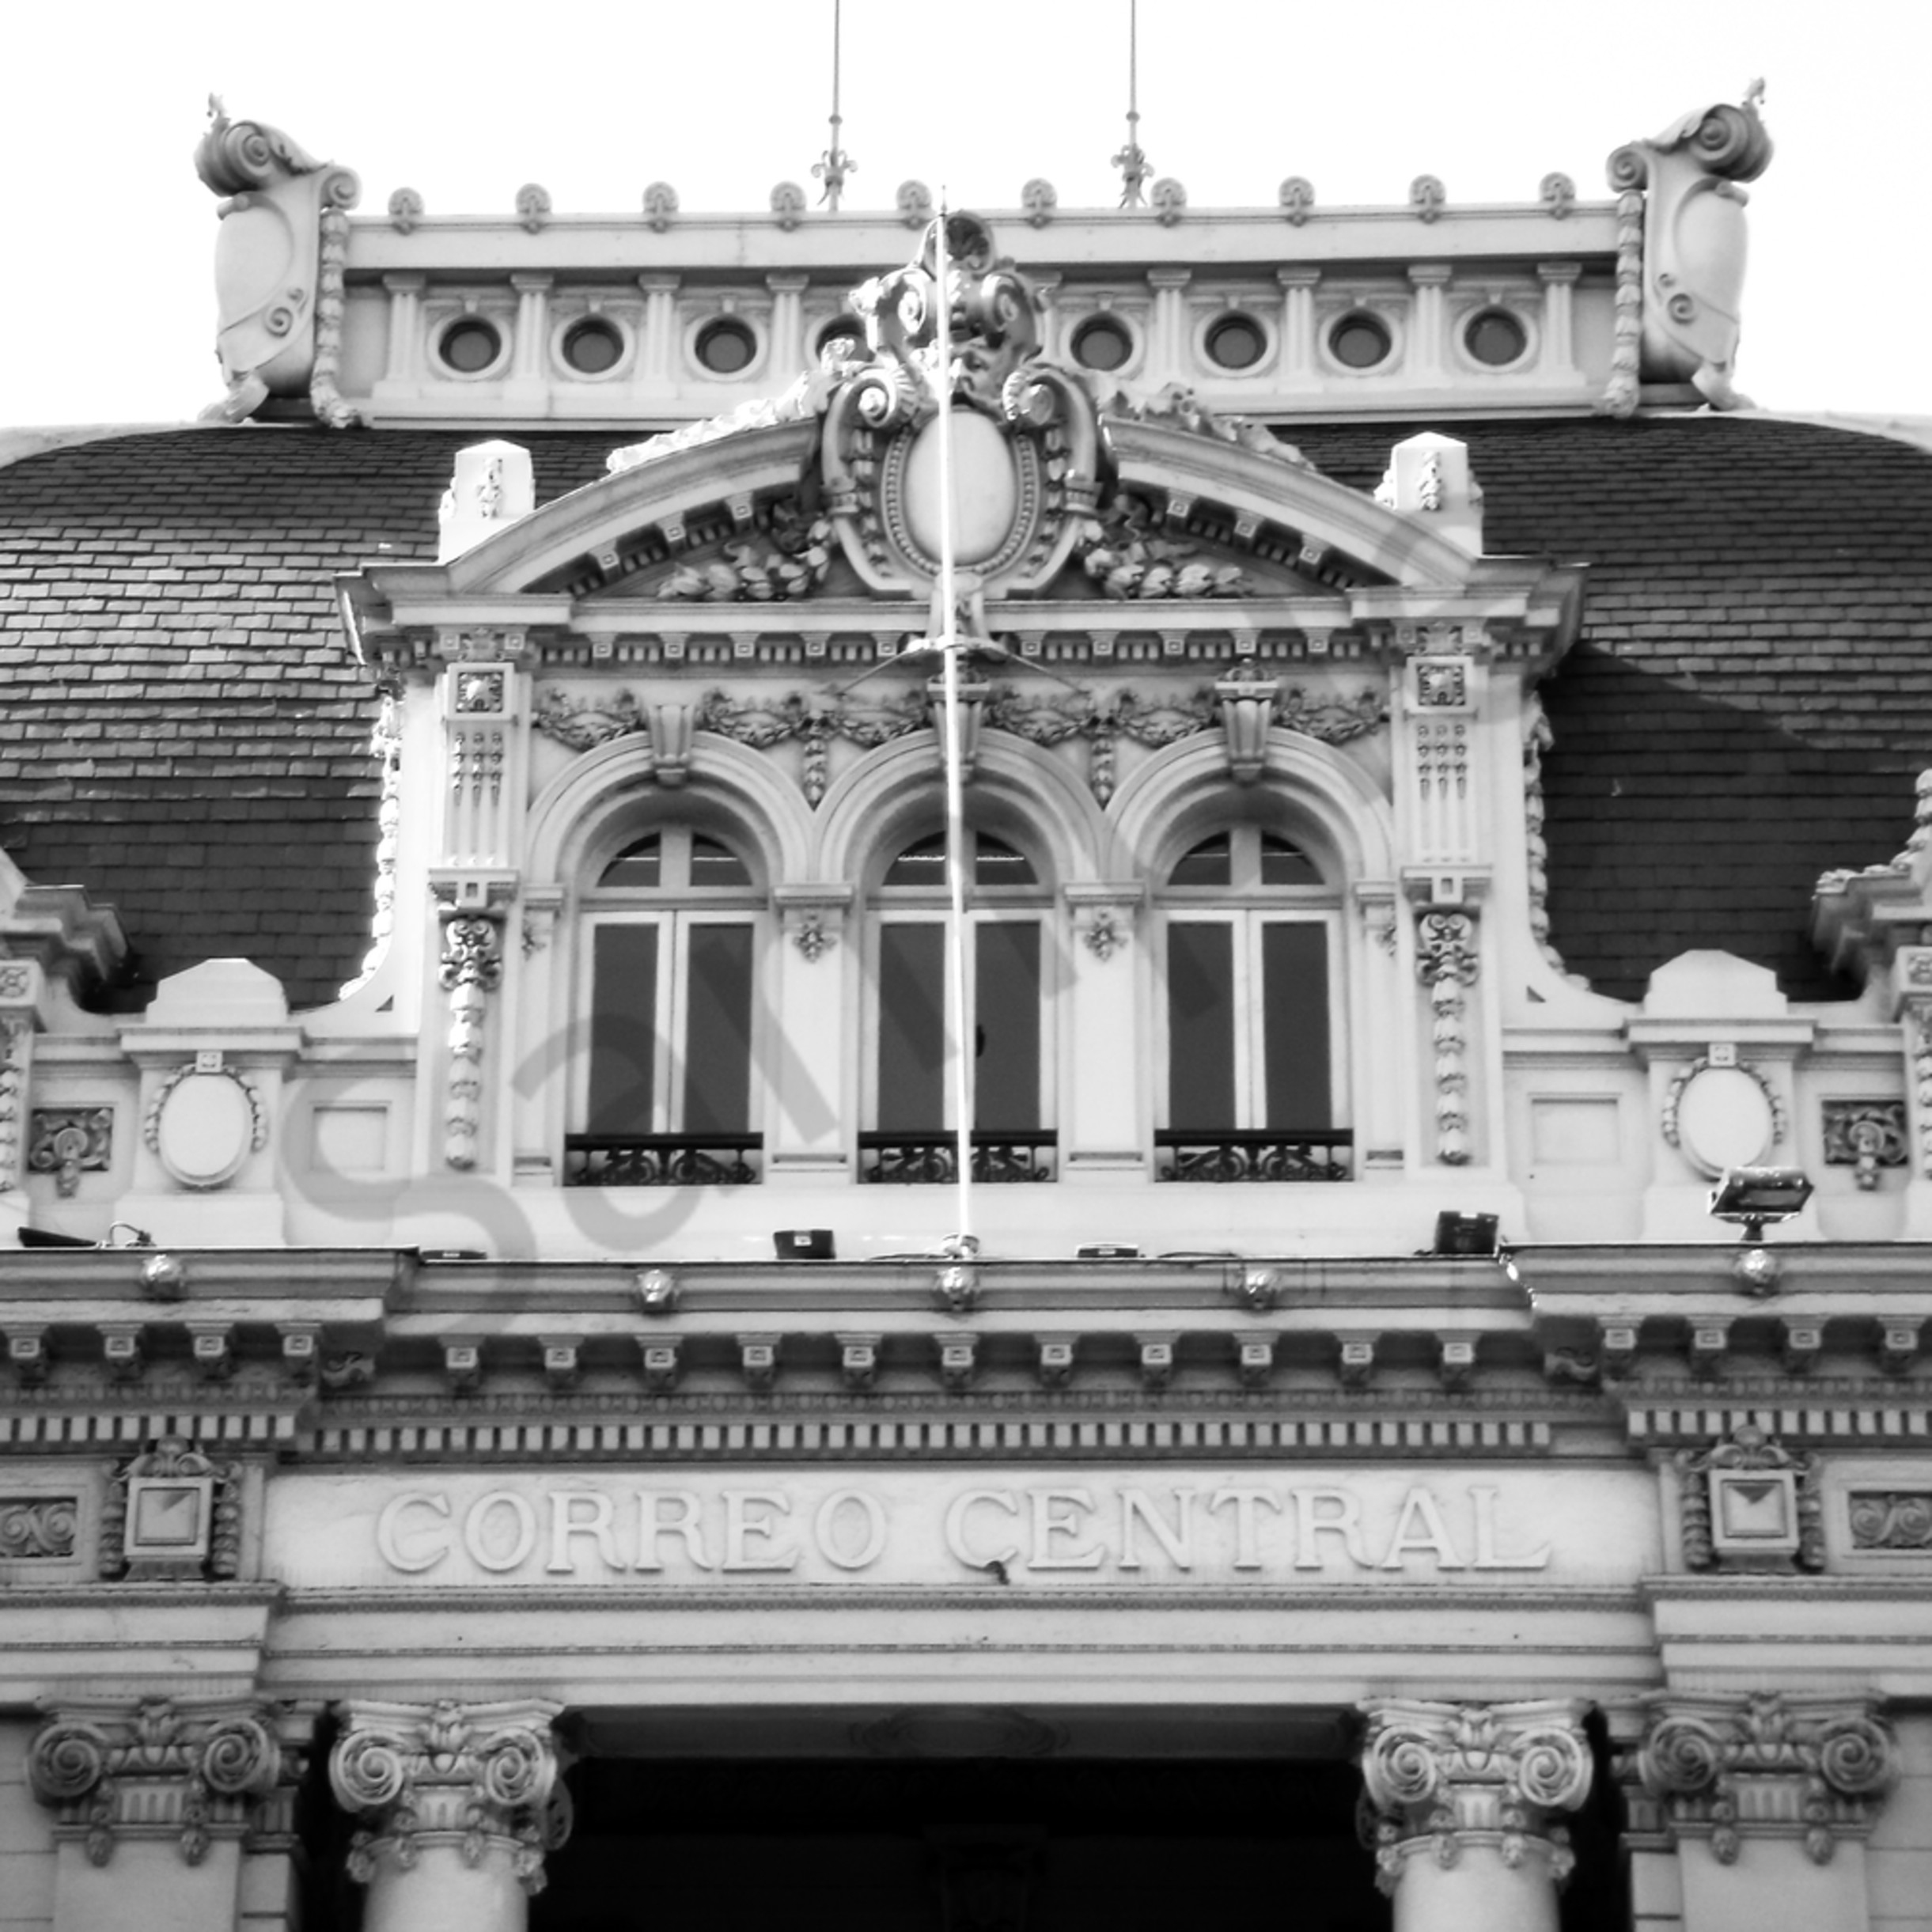 Correo central building kfawbc